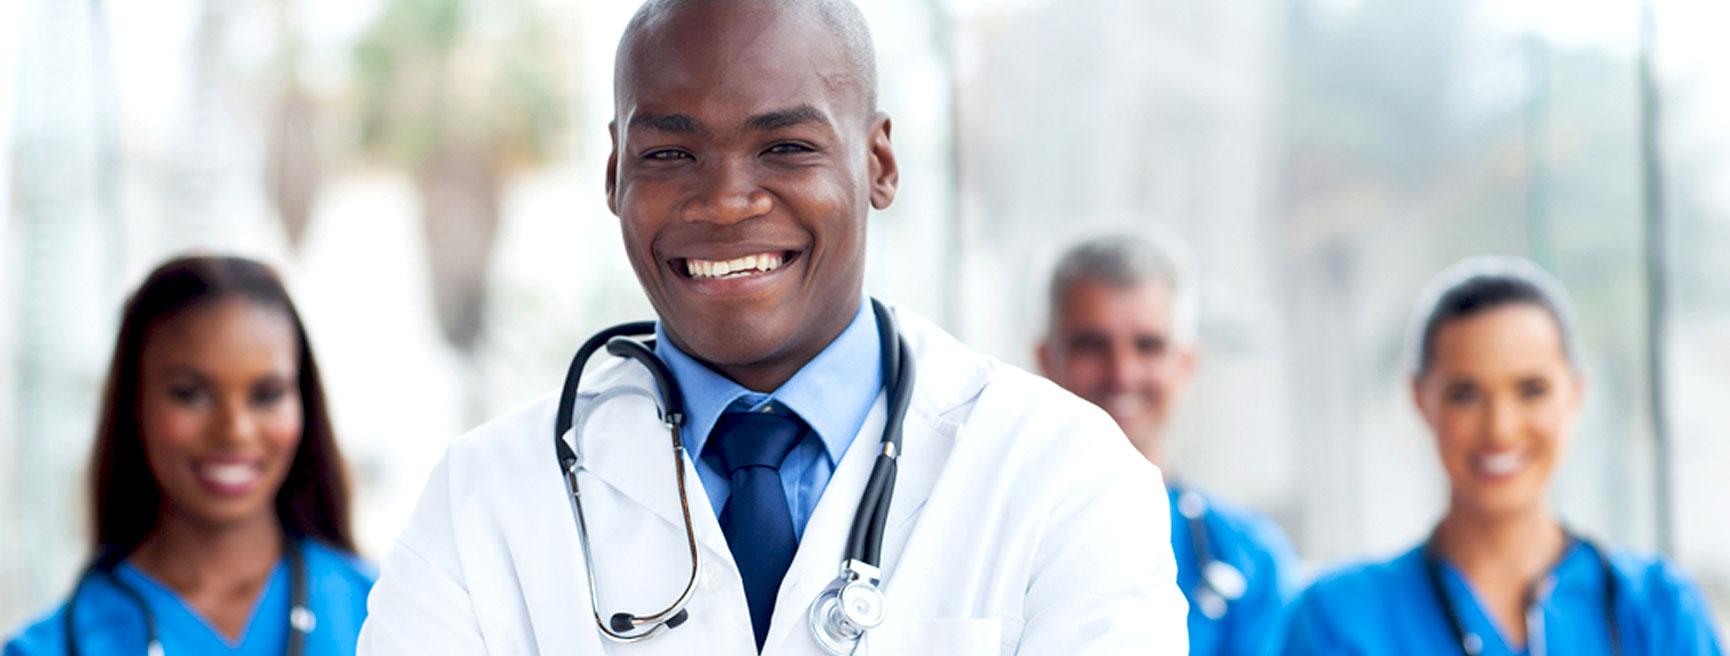 Brooklyn's Top Healthcare Provider